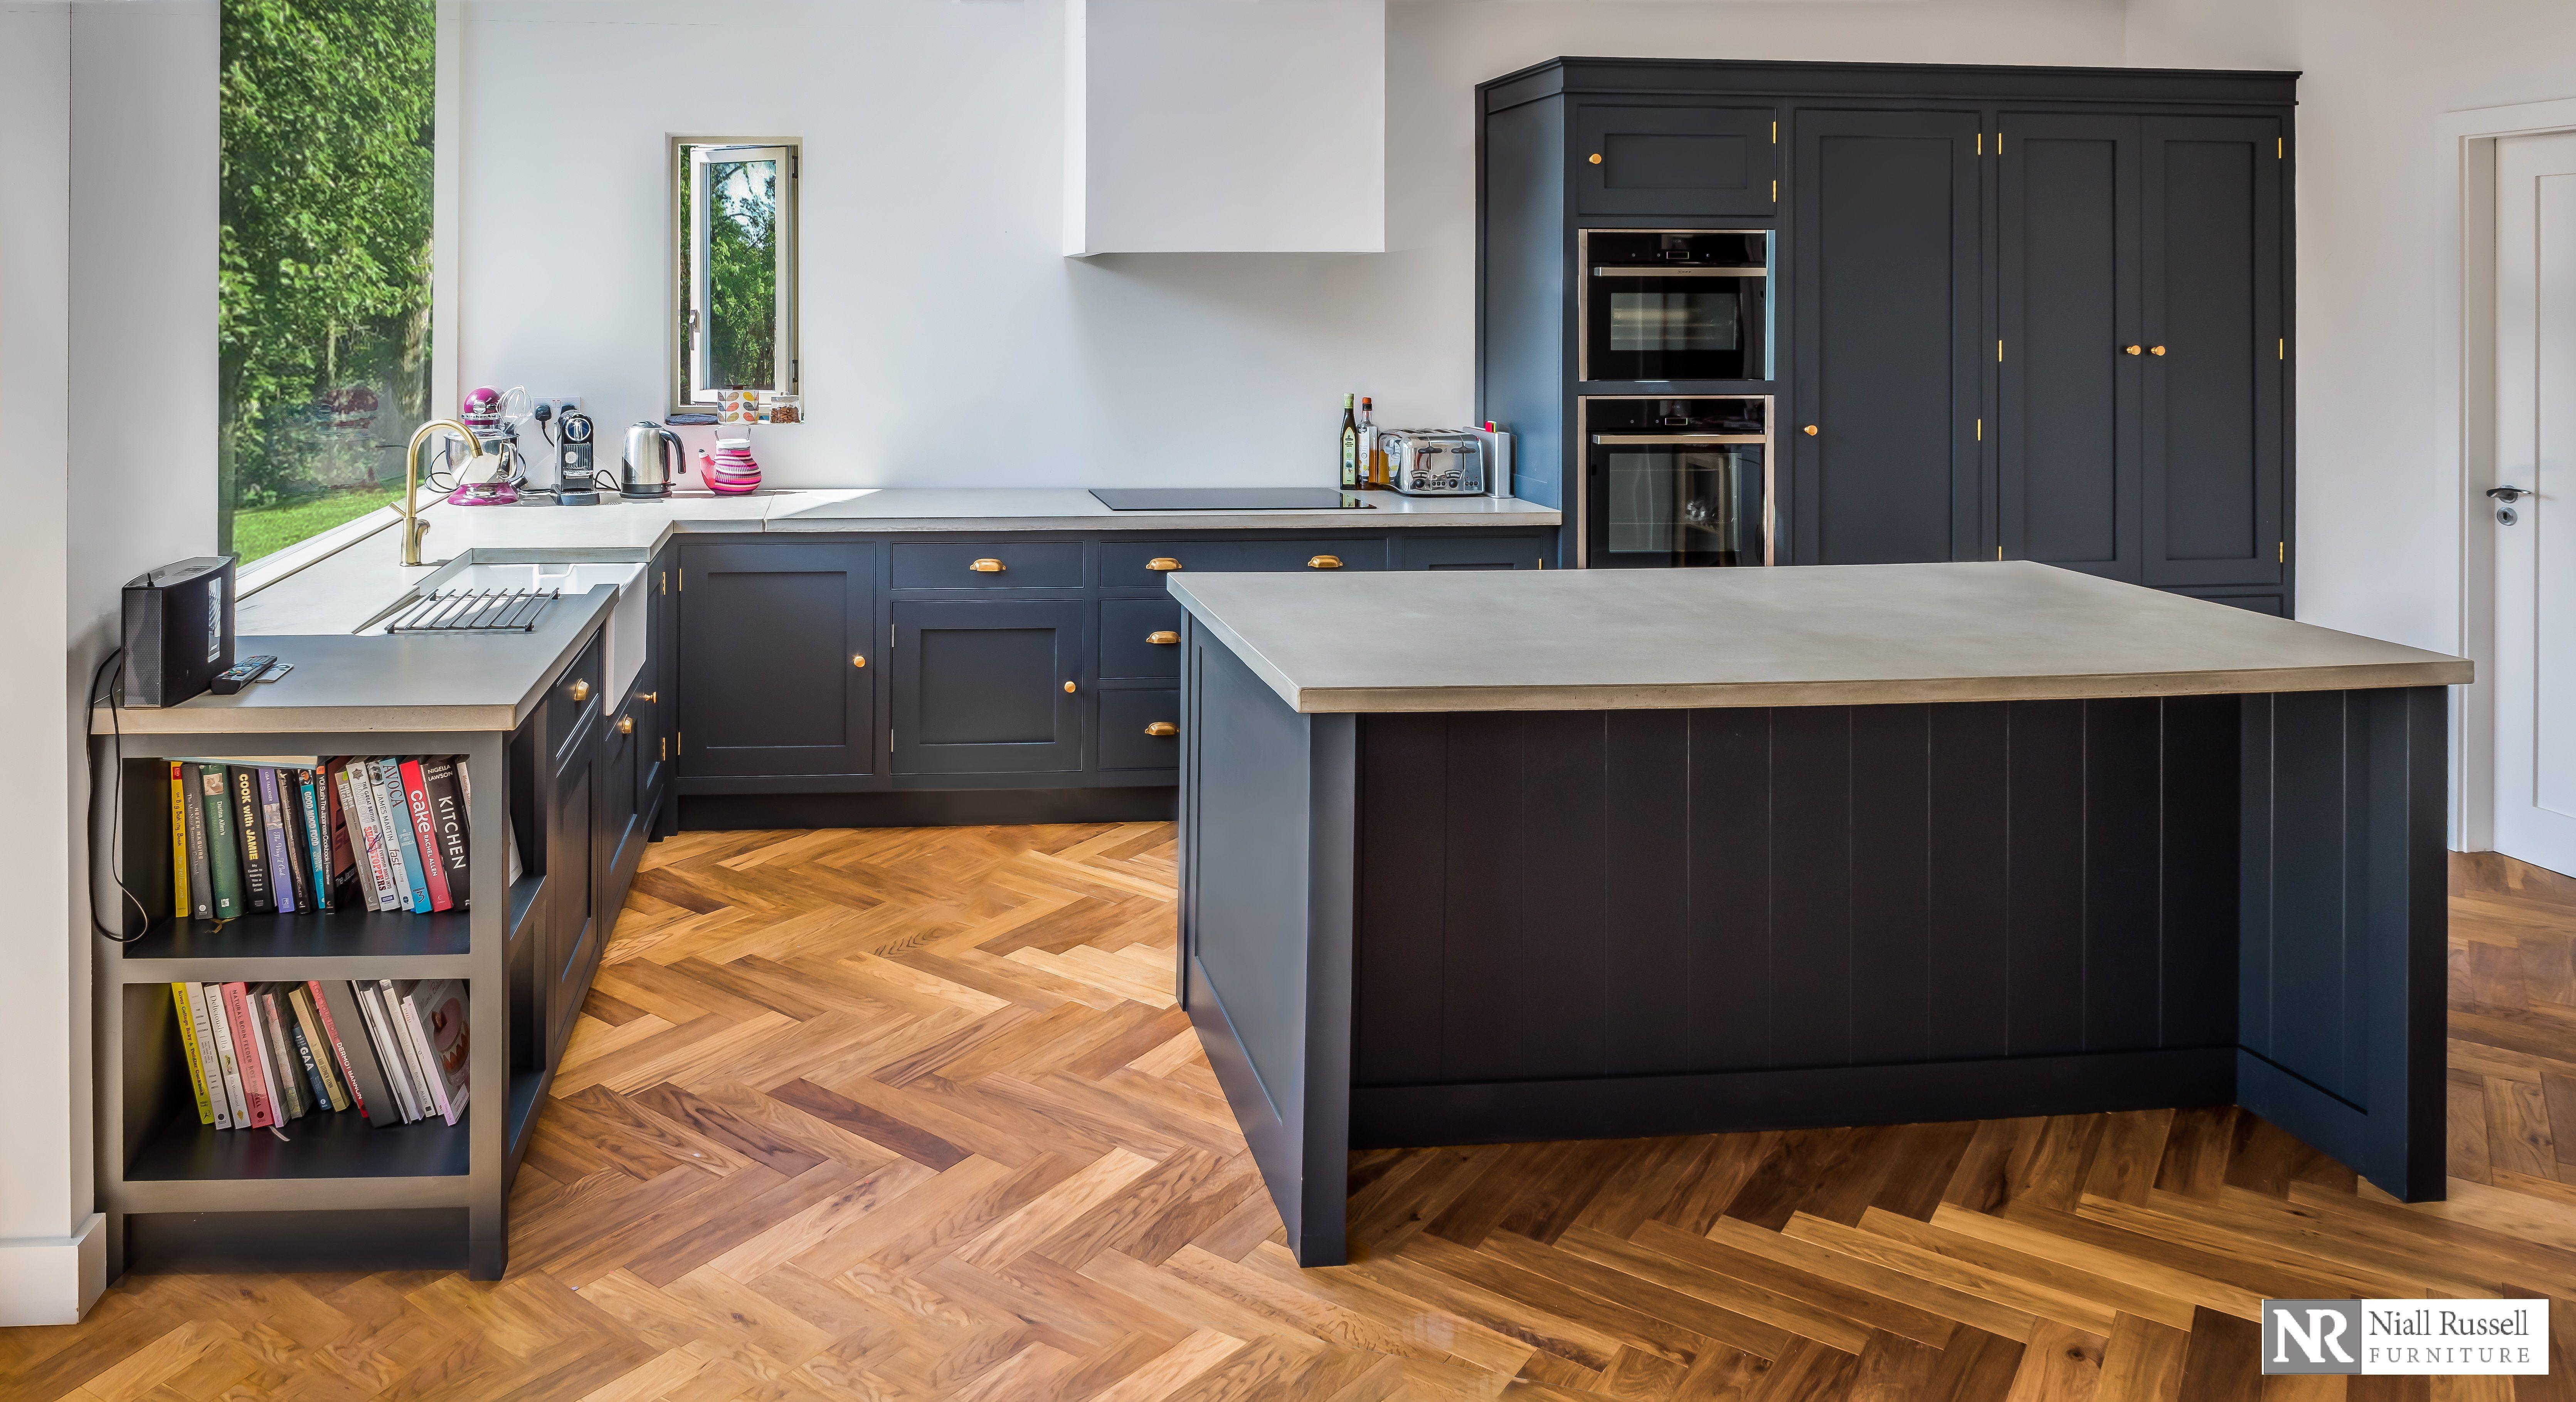 Niall Russell Furniture Inframe Kitchens And Bespoke Hand Painted Furniture Irishtown Co Mayo Dundrum Kitchen Renovation Inframe Kitchen Kitchen